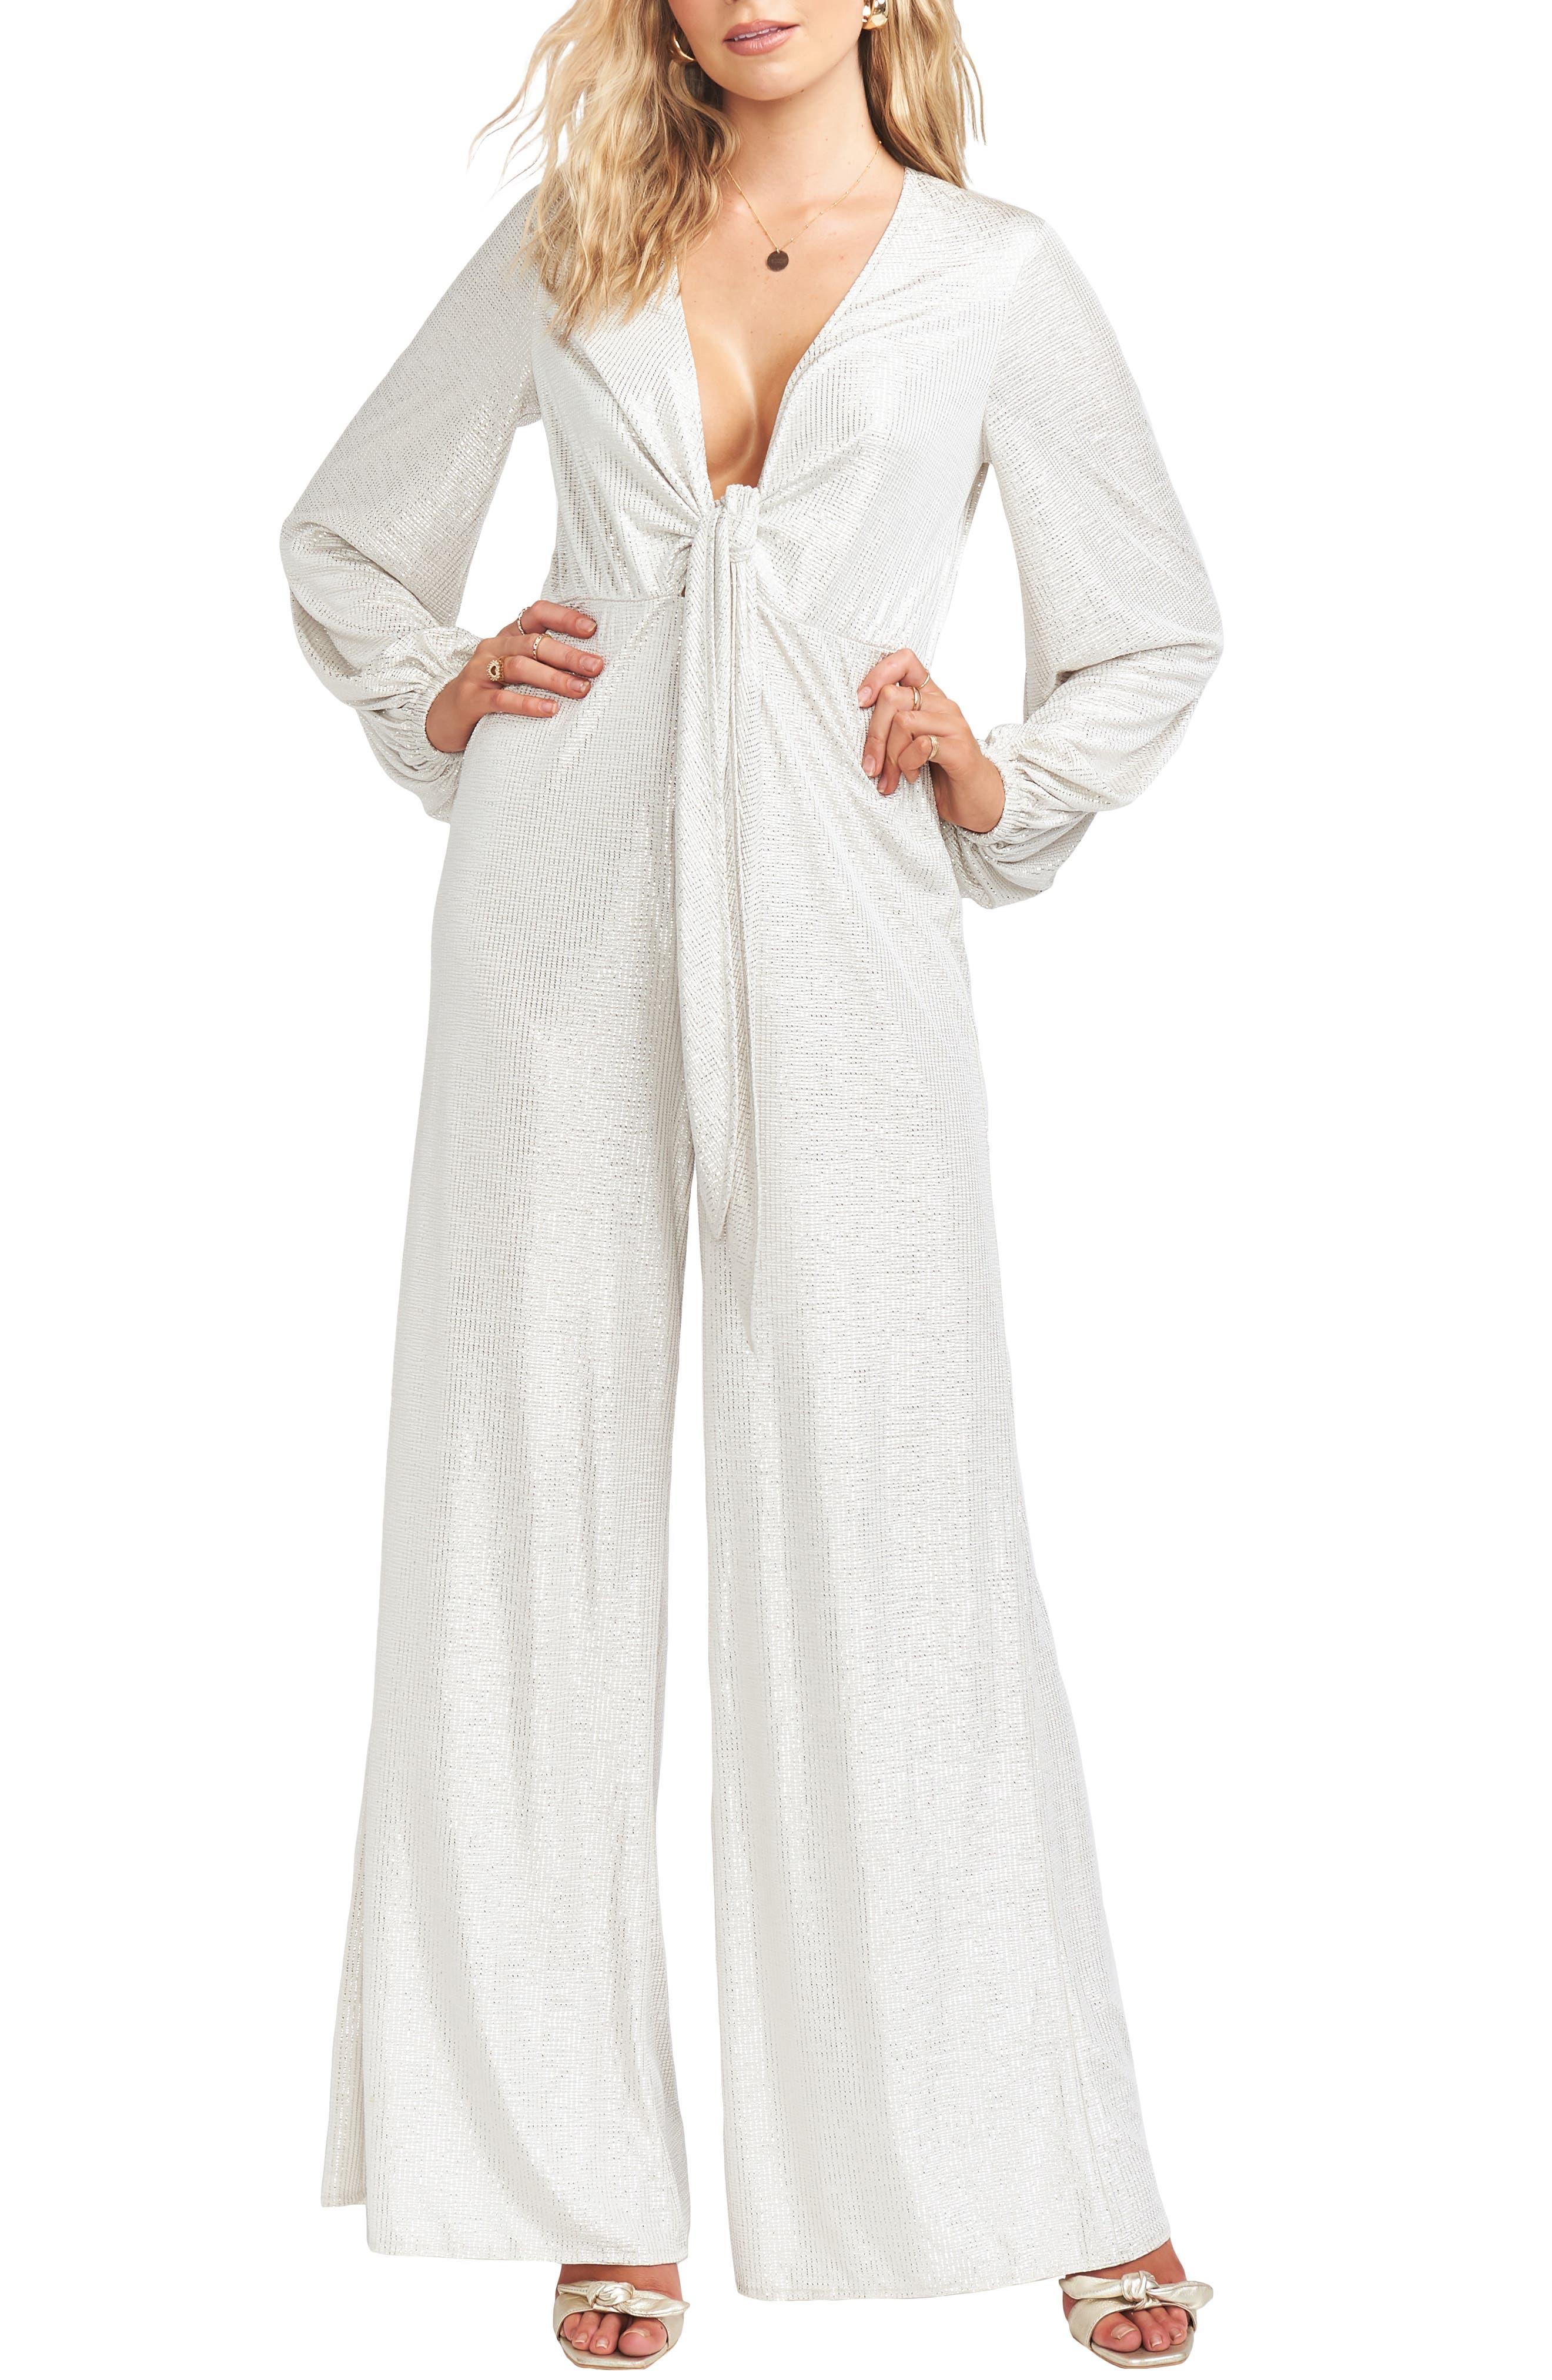 60s Wedding Dresses | 70s Wedding Dresses Womens Show Me Your Mumu Angela Metallic Long Sleeve Jumpsuit $130.80 AT vintagedancer.com